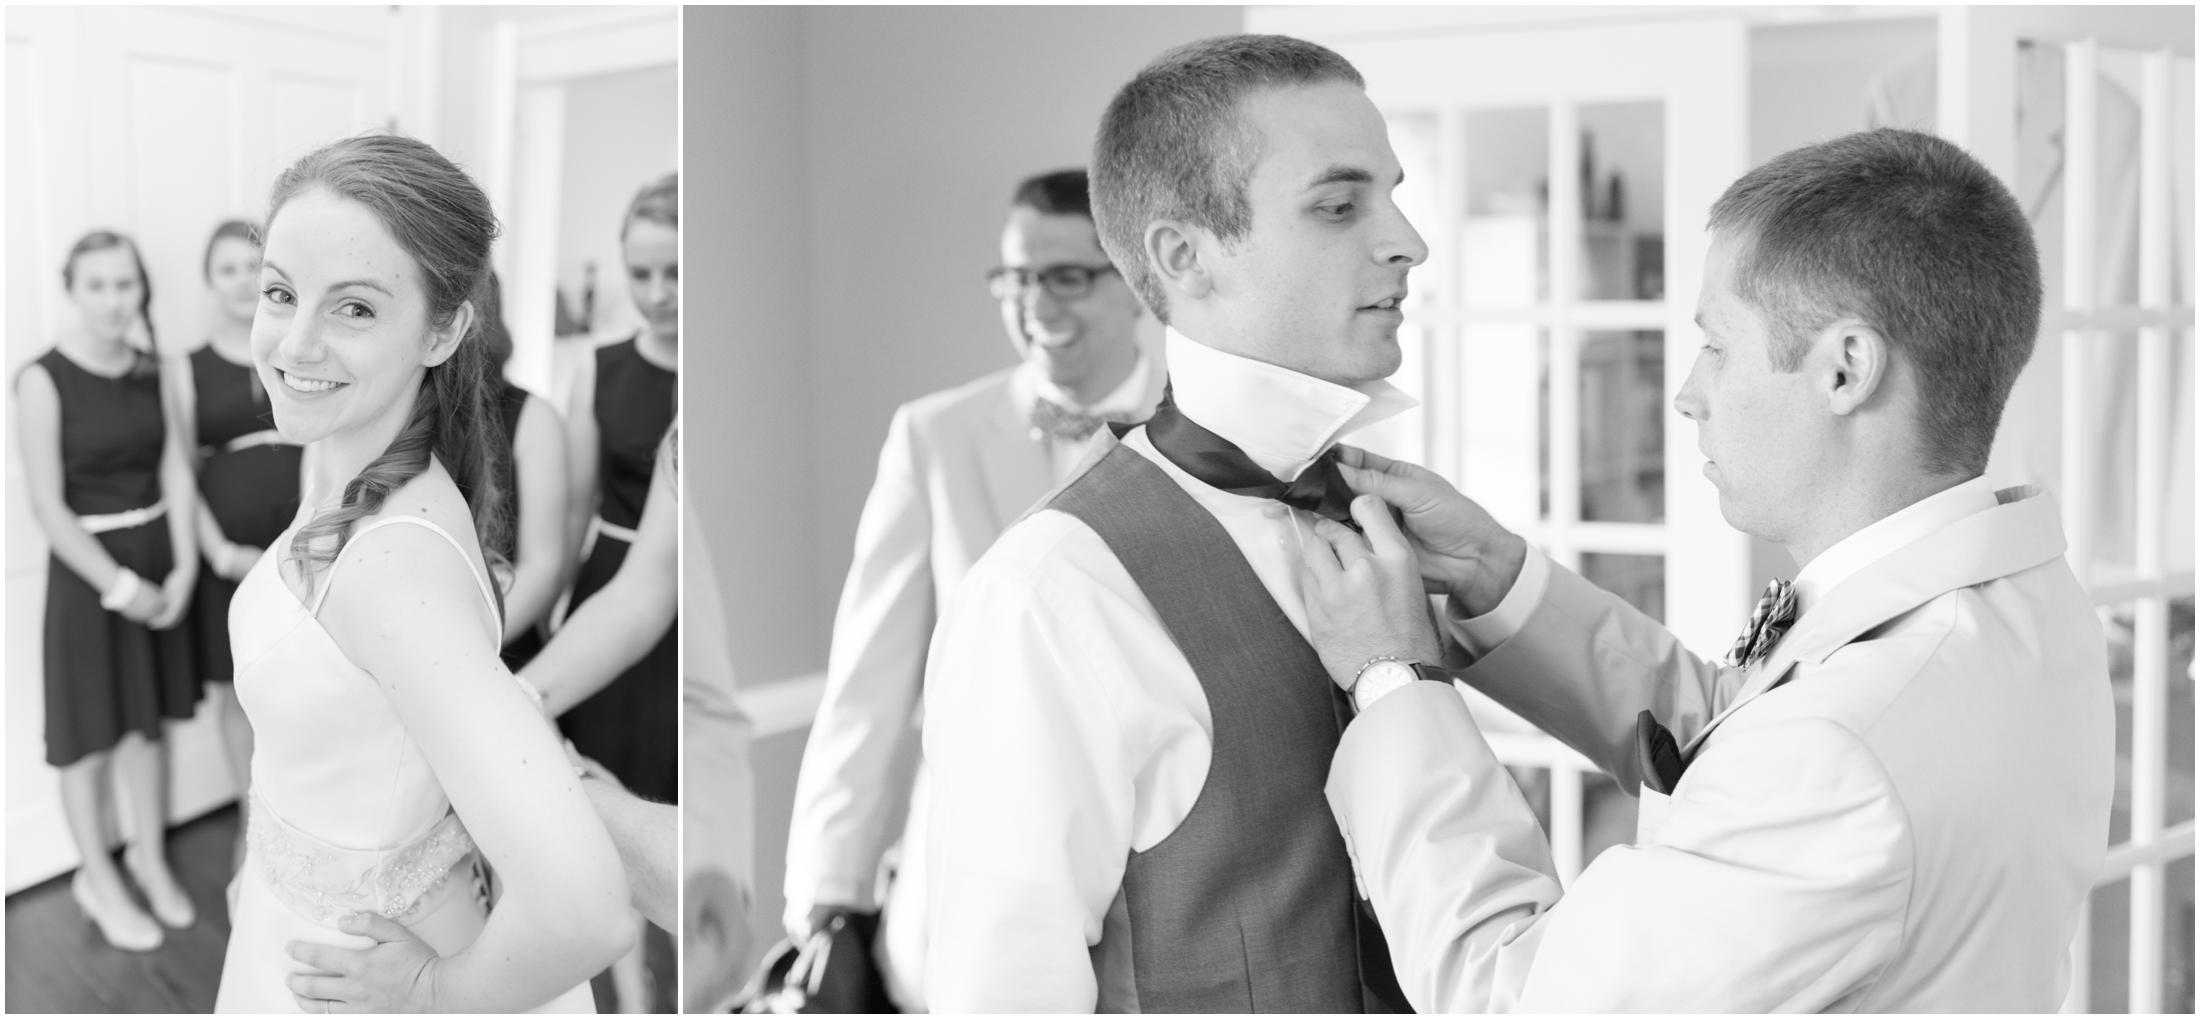 Nash-Wedding-Details-and-Getting Ready-71.jpg